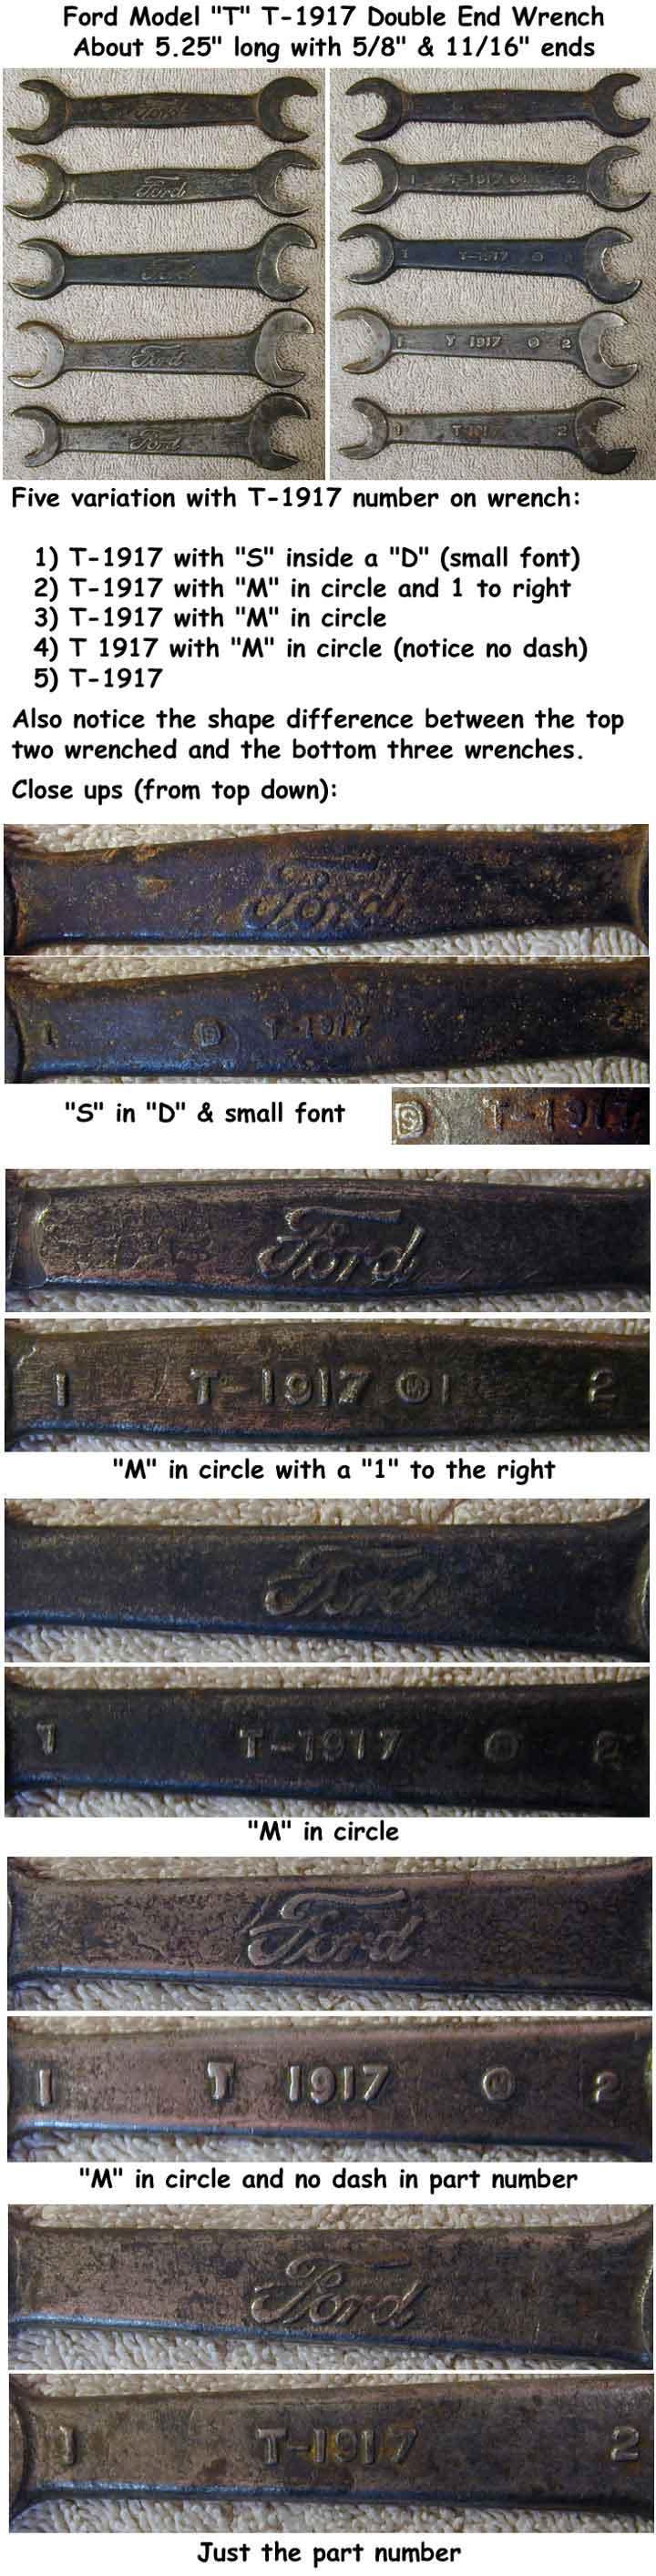 Ford.T1917.jpg